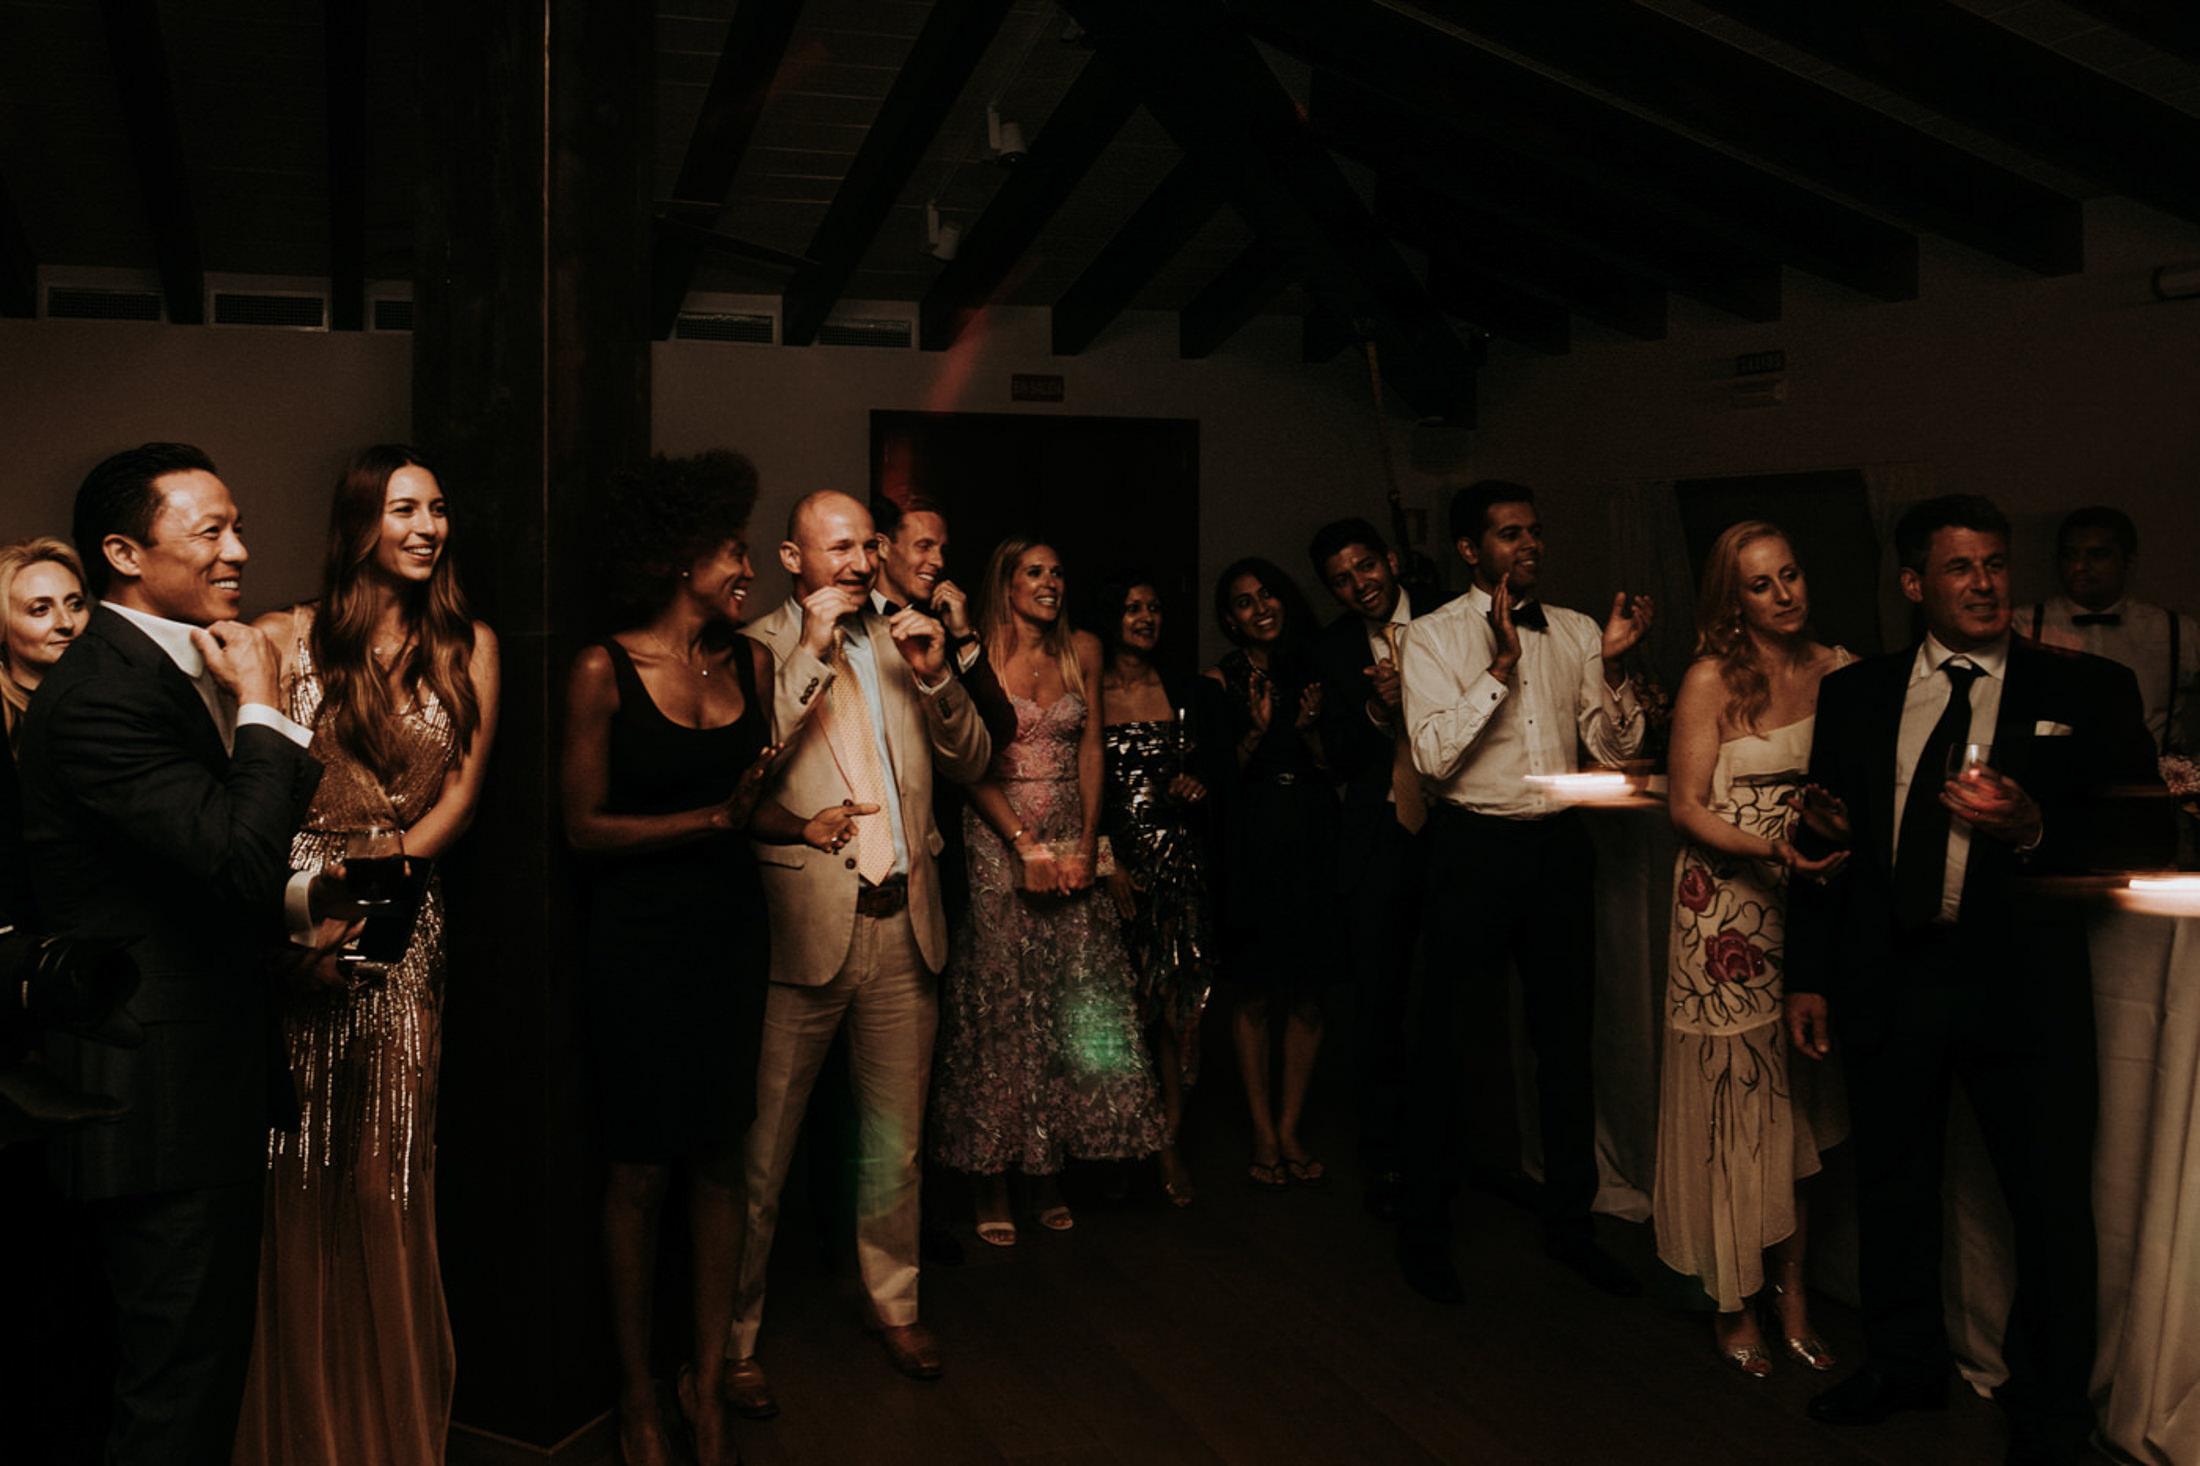 Wedding_Photographer_Mallorca_Daniela-Marquardt_Photography_New_York_Iceland_Tuscany_Santorini_Portugal_Austria_Bavaria_Elopement_Hochzeitsfotograf_AntjeRajat2_120